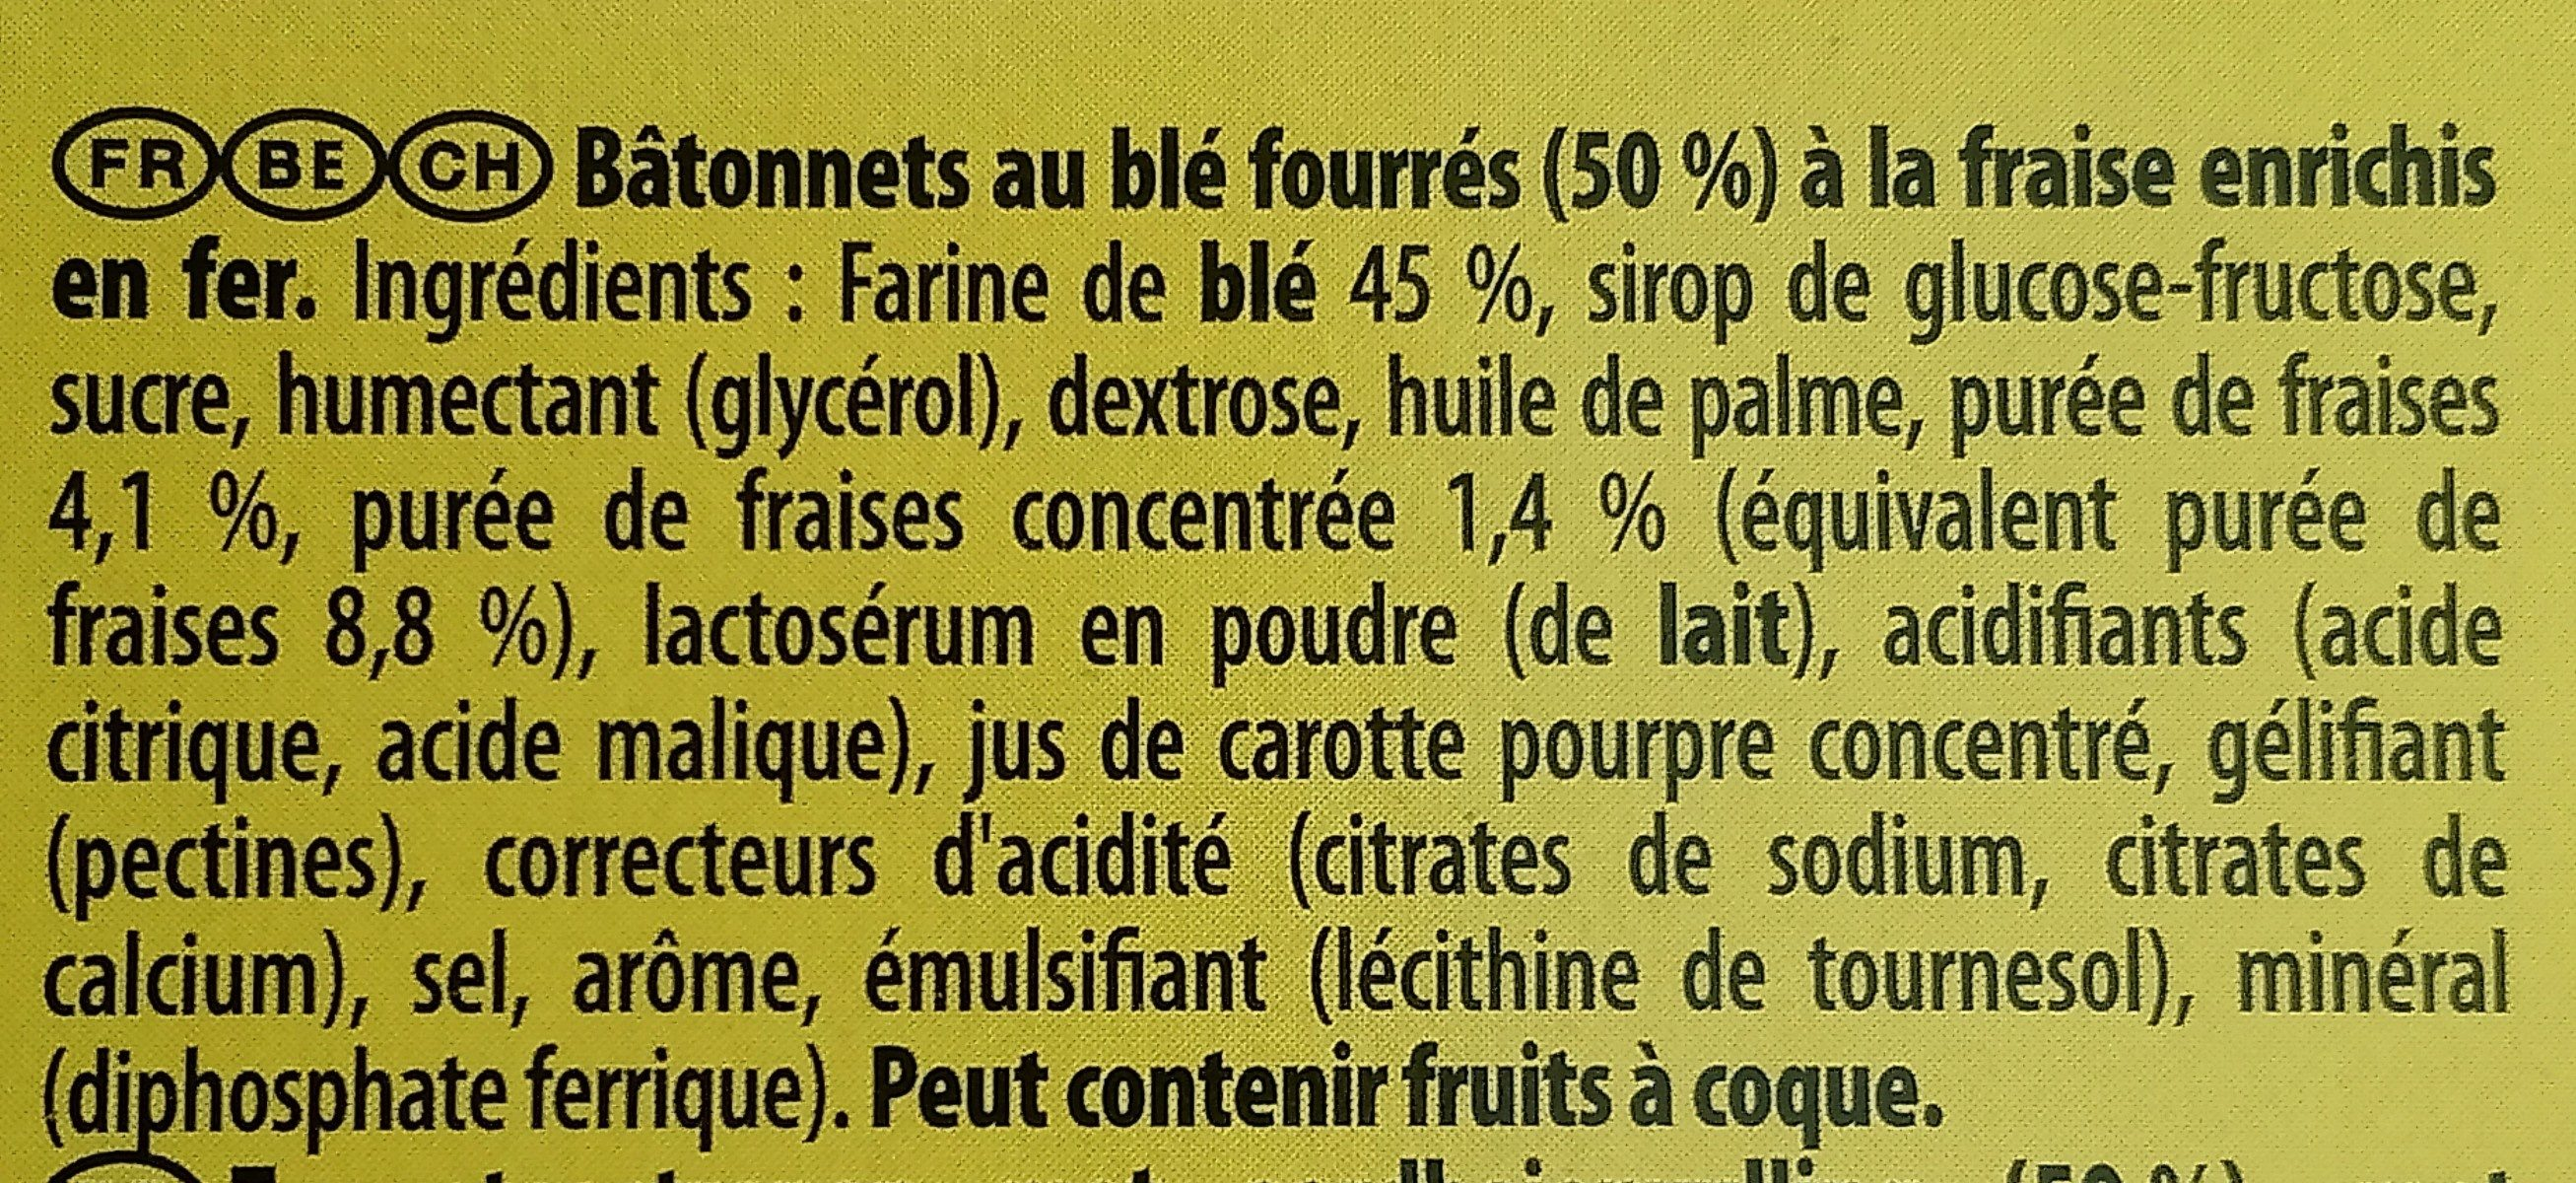 Cracotte Fraise - Ingrédients - fr